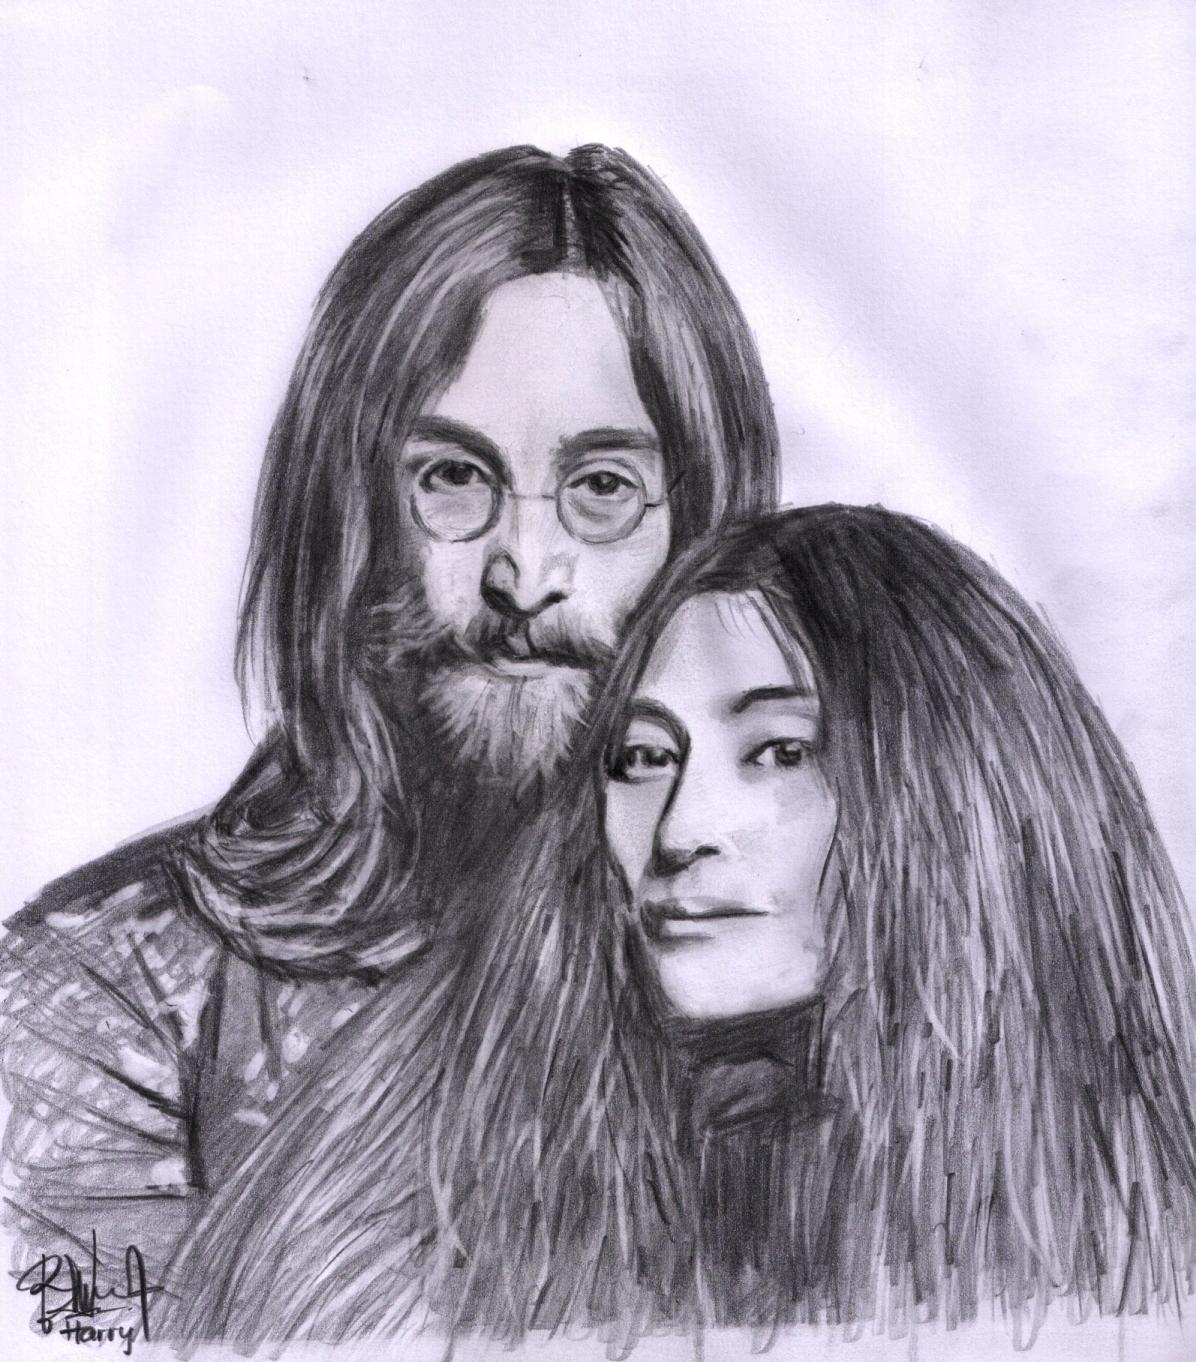 British Beatles Fan Club: Imagine the Art of John Lennon |Sketches John Lennon And Yoko Ono